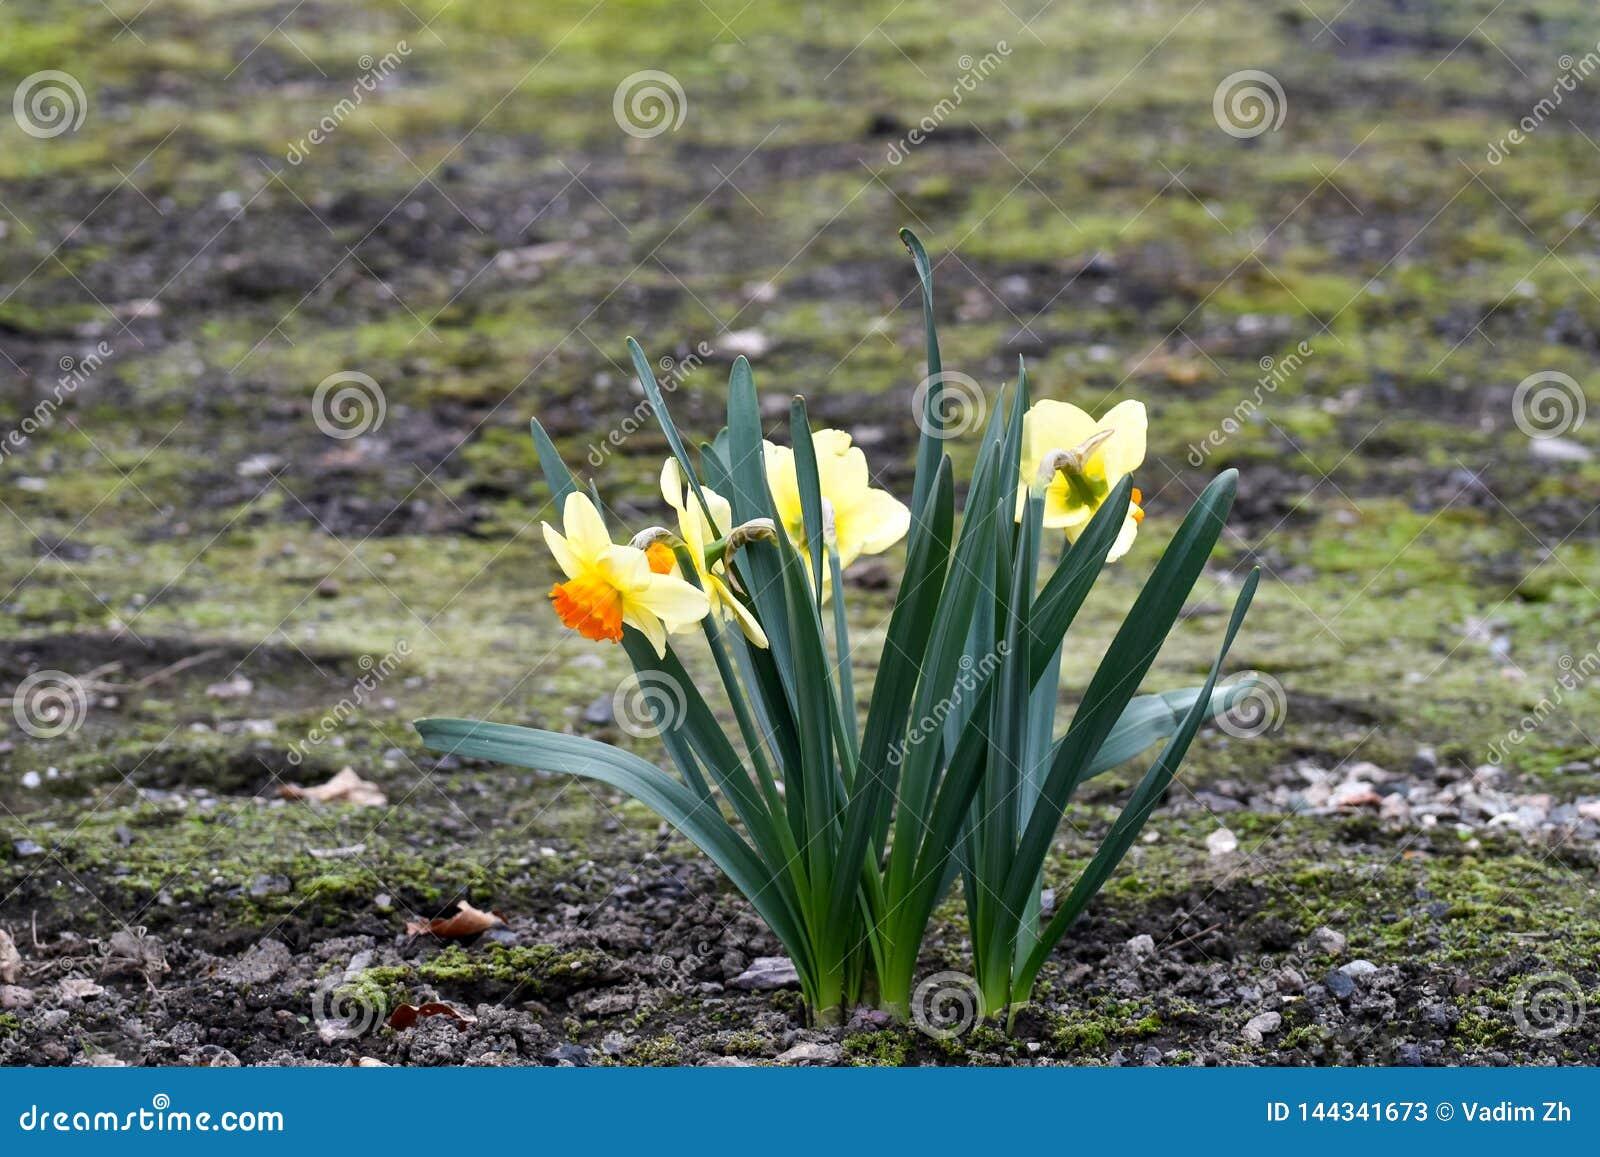 Beautiful spring flowers narcissus jonquilla, jonquil, rush daffodil